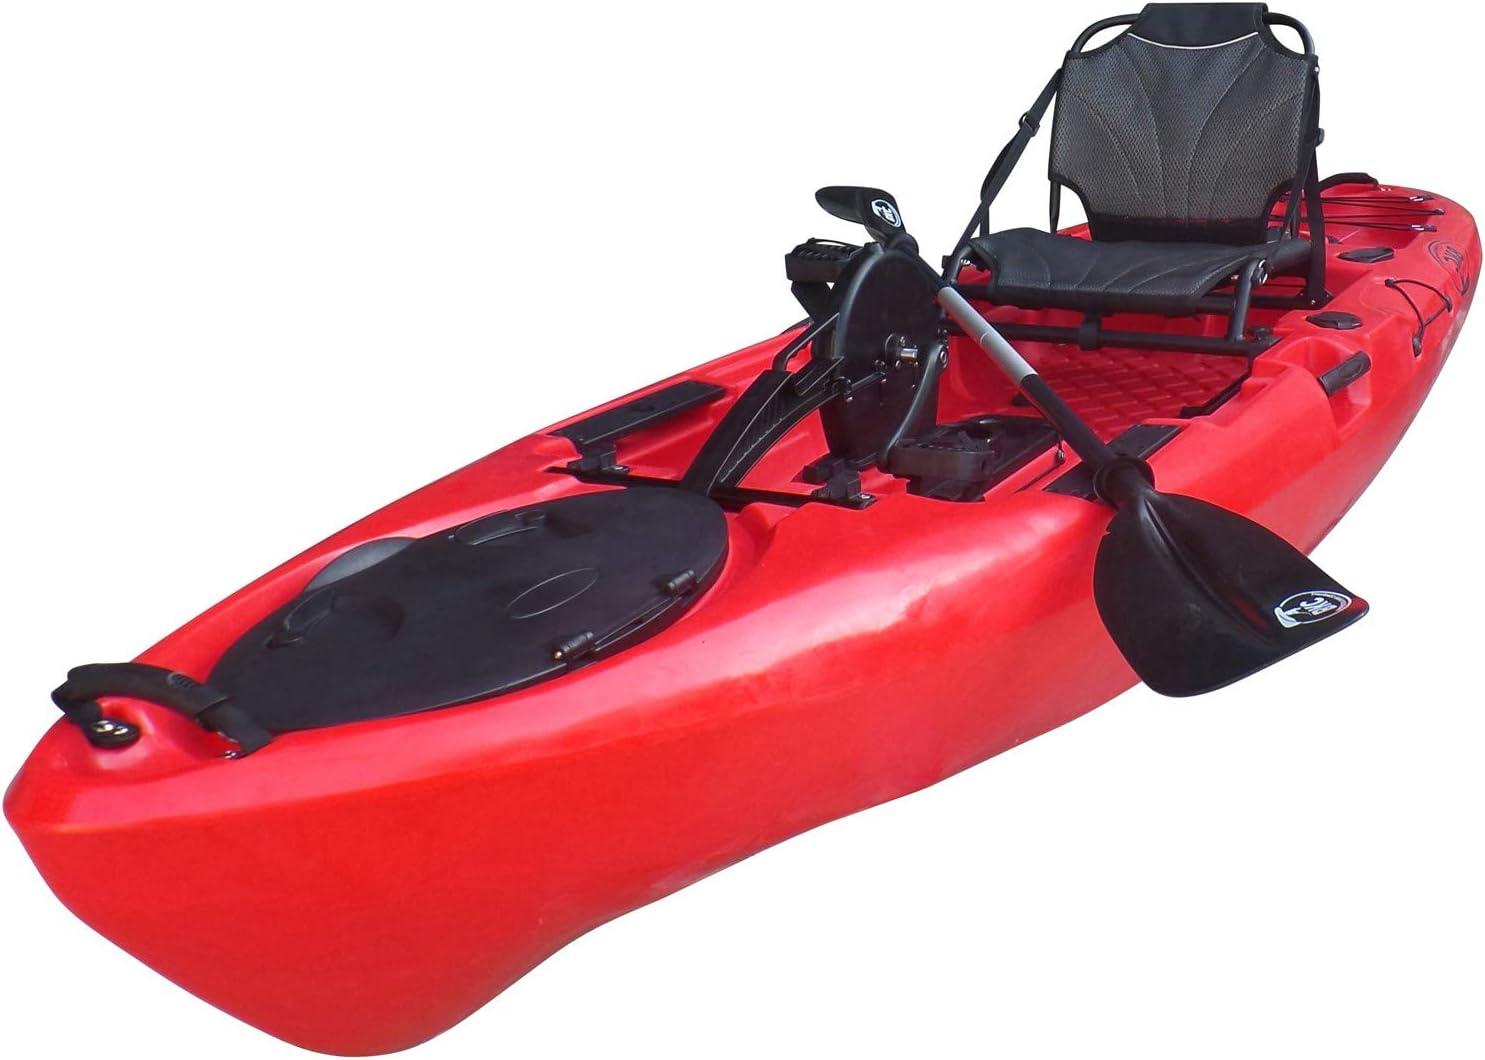 BKC PK11 10.6' Single Propeller Pedal Drive Fishing Kayak